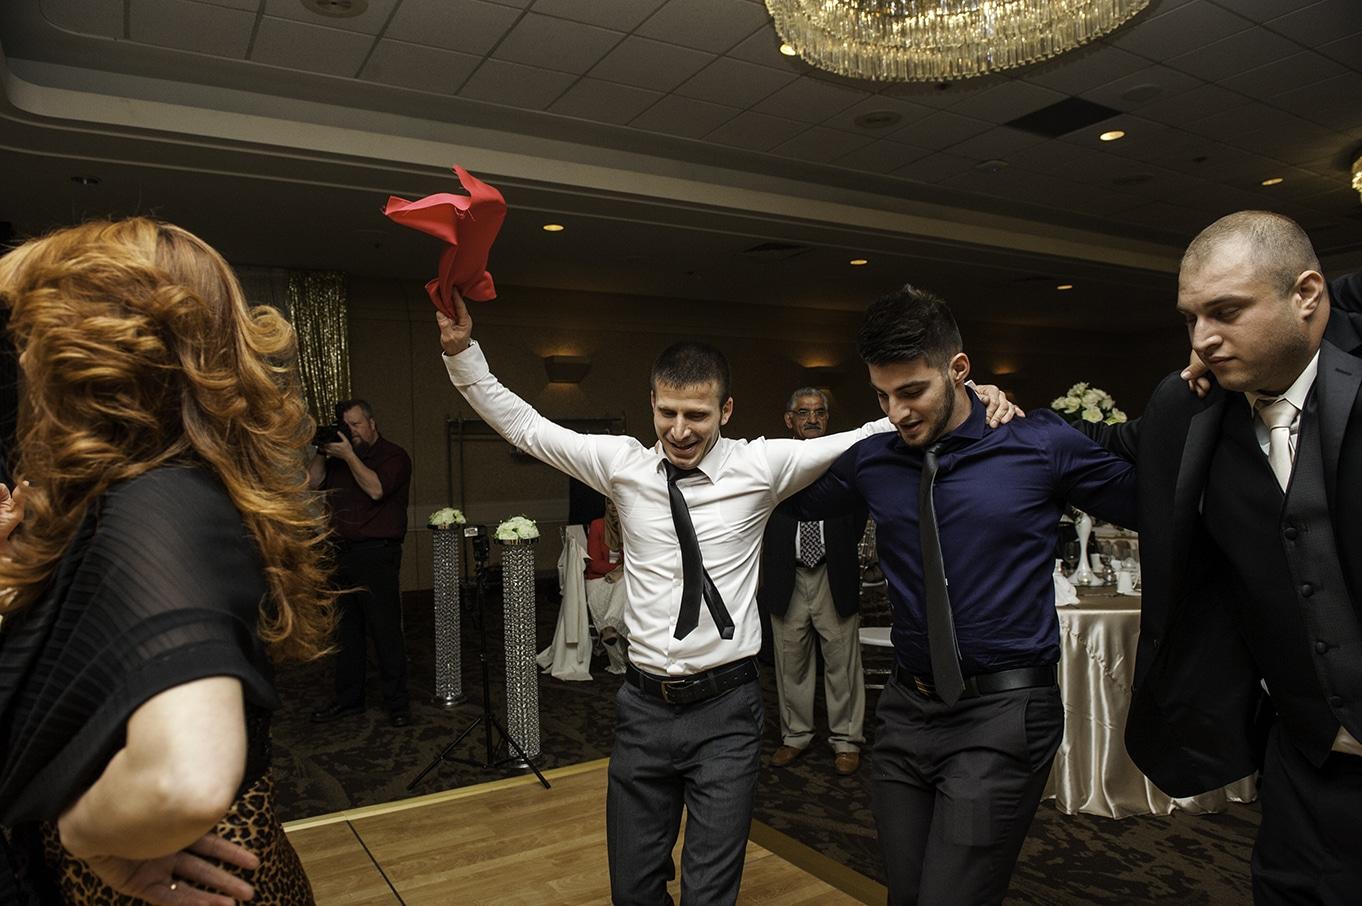 DSC_5325 copymiddle eastern wedding dance